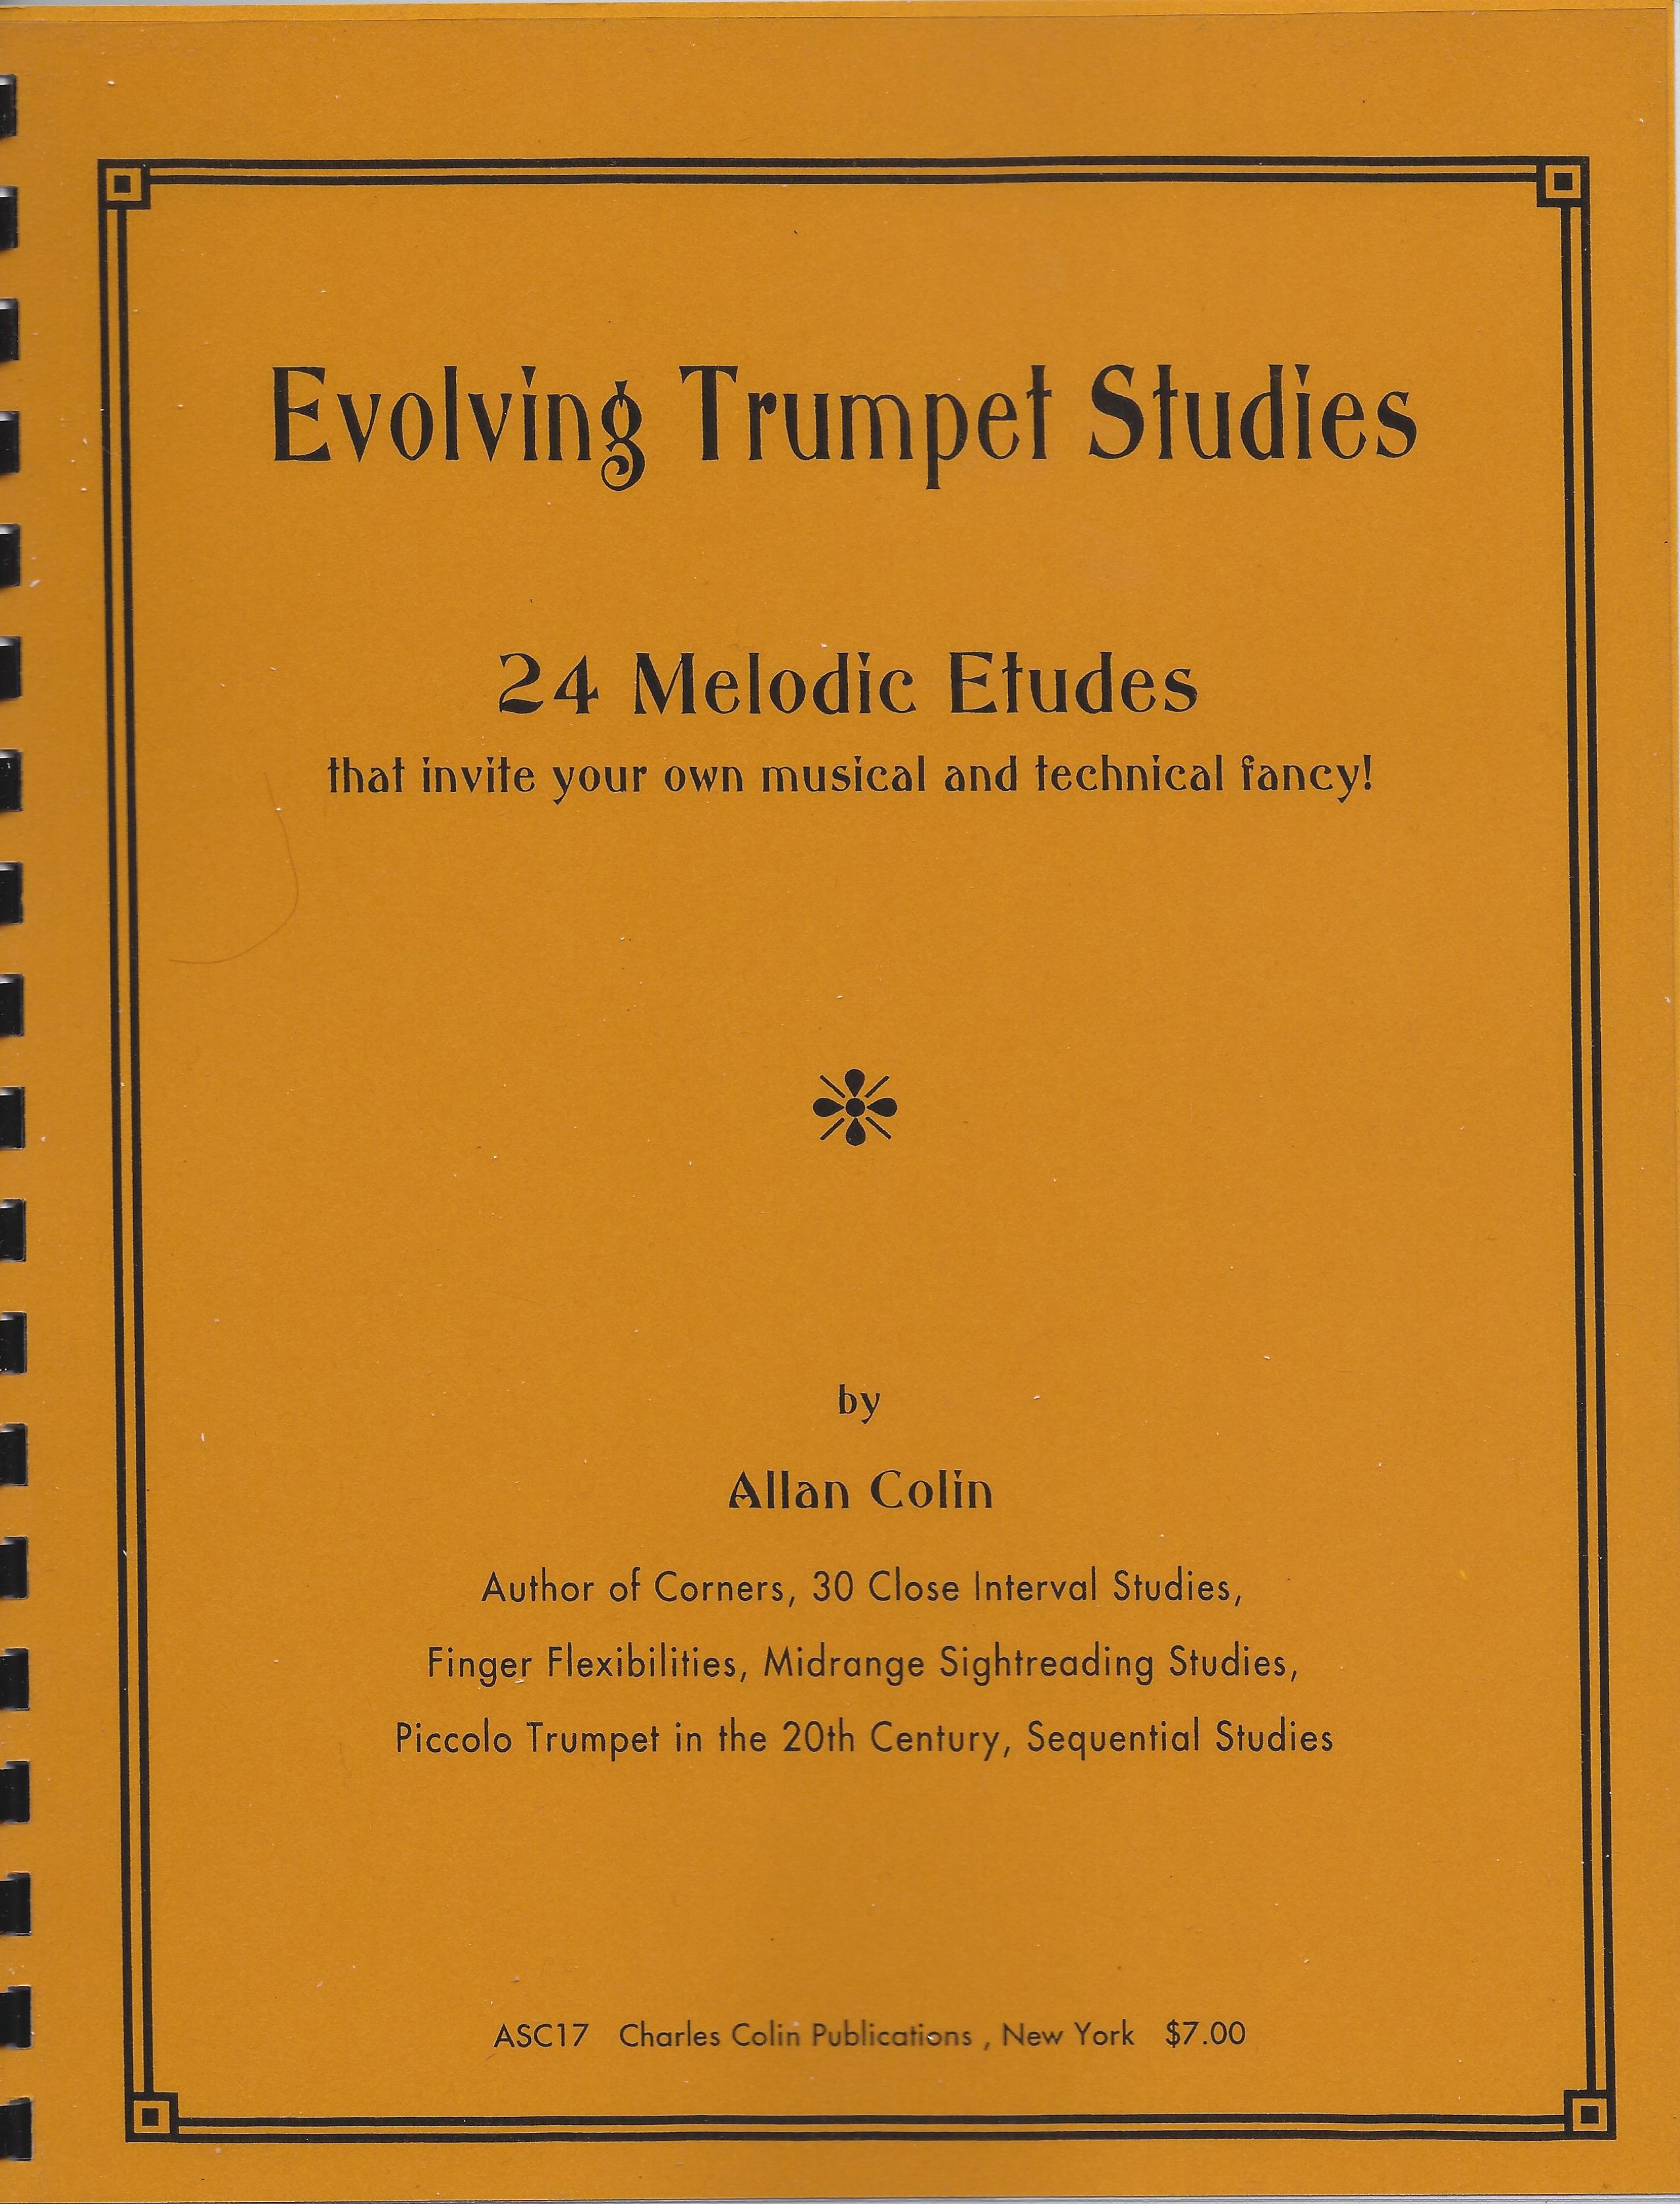 Evolving Trumpet Studies